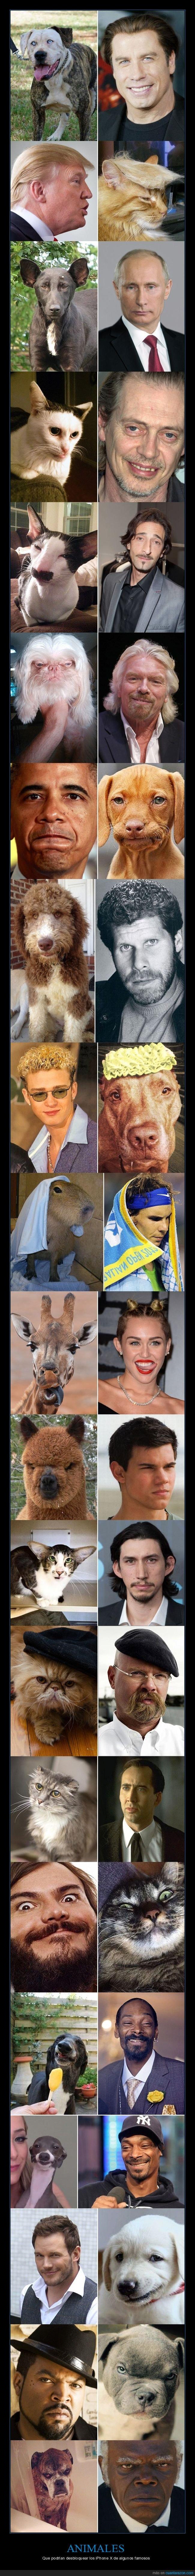 animales,famosos,parecidos